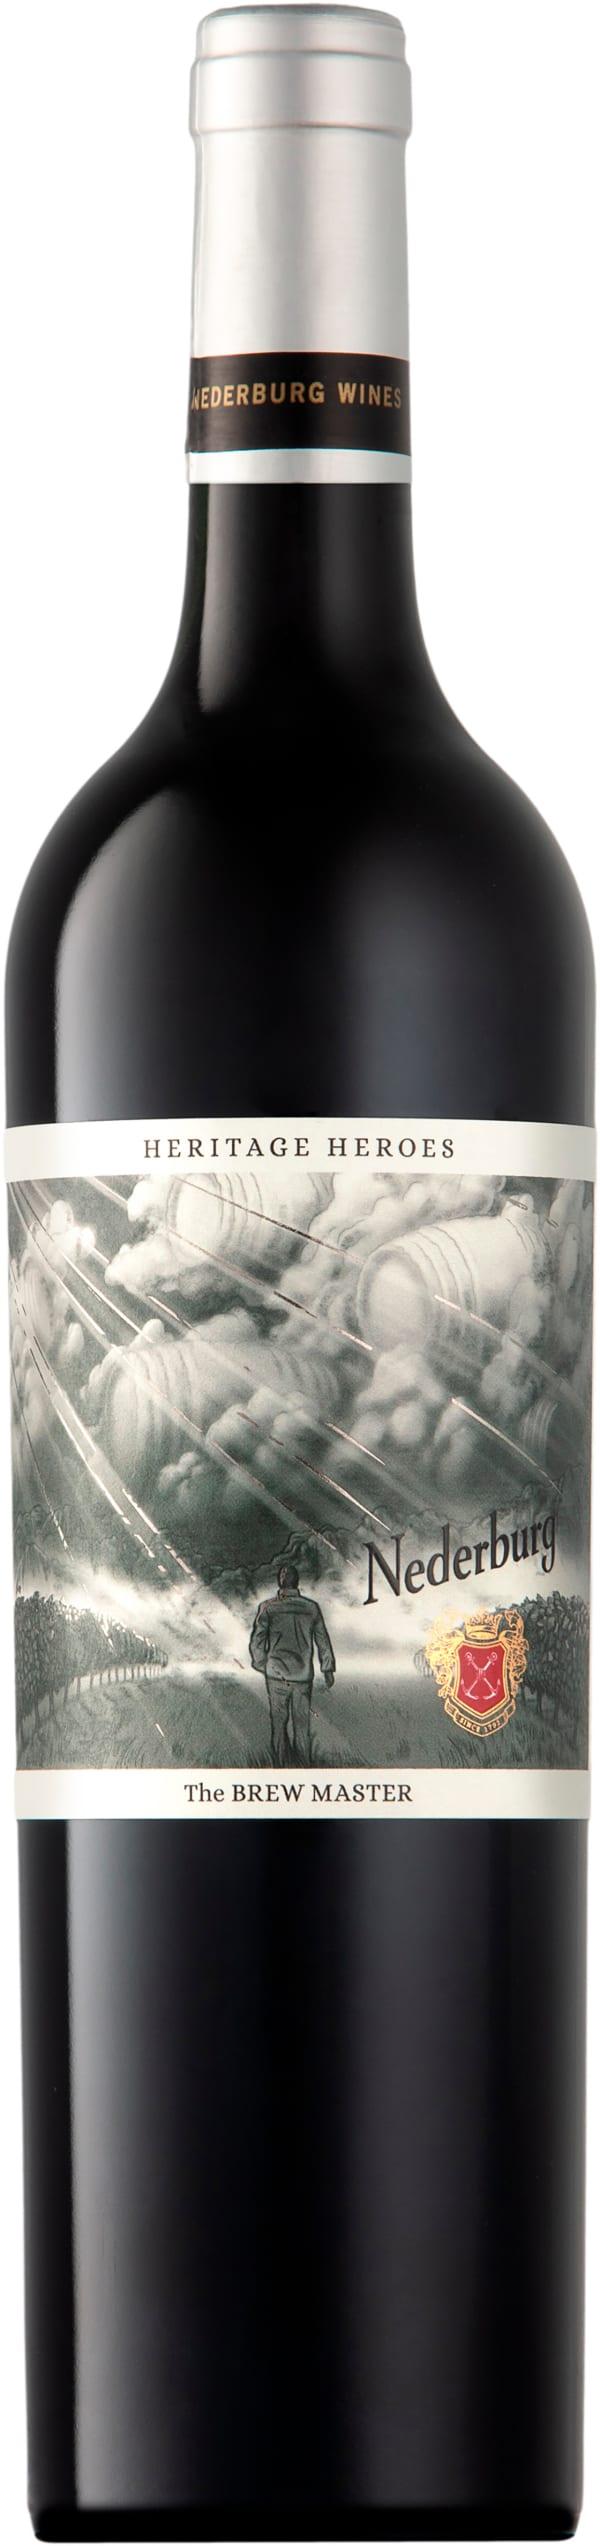 Nederburg The Brew Master 2013